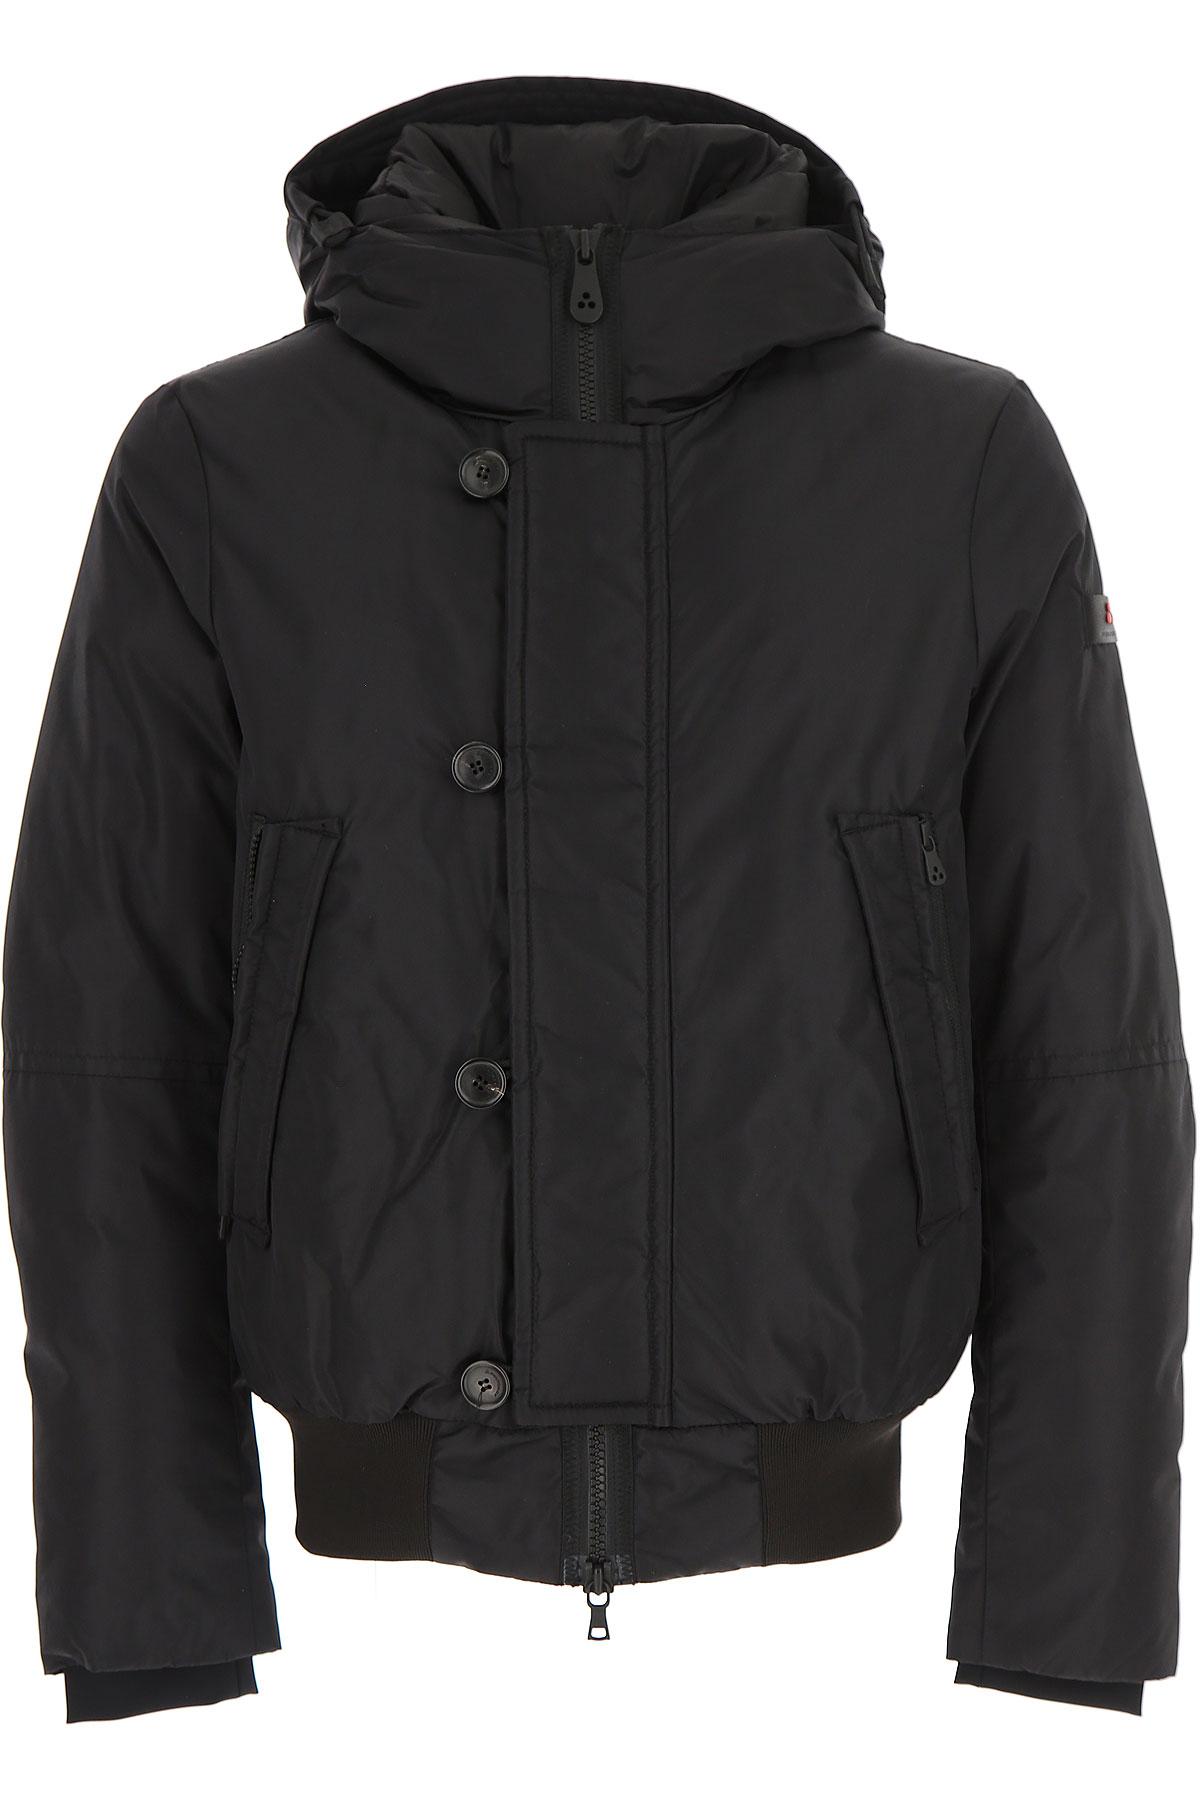 Image of Peuterey Down Jacket for Men, Puffer Ski Jacket, Black, Down, 2017, L M S XL